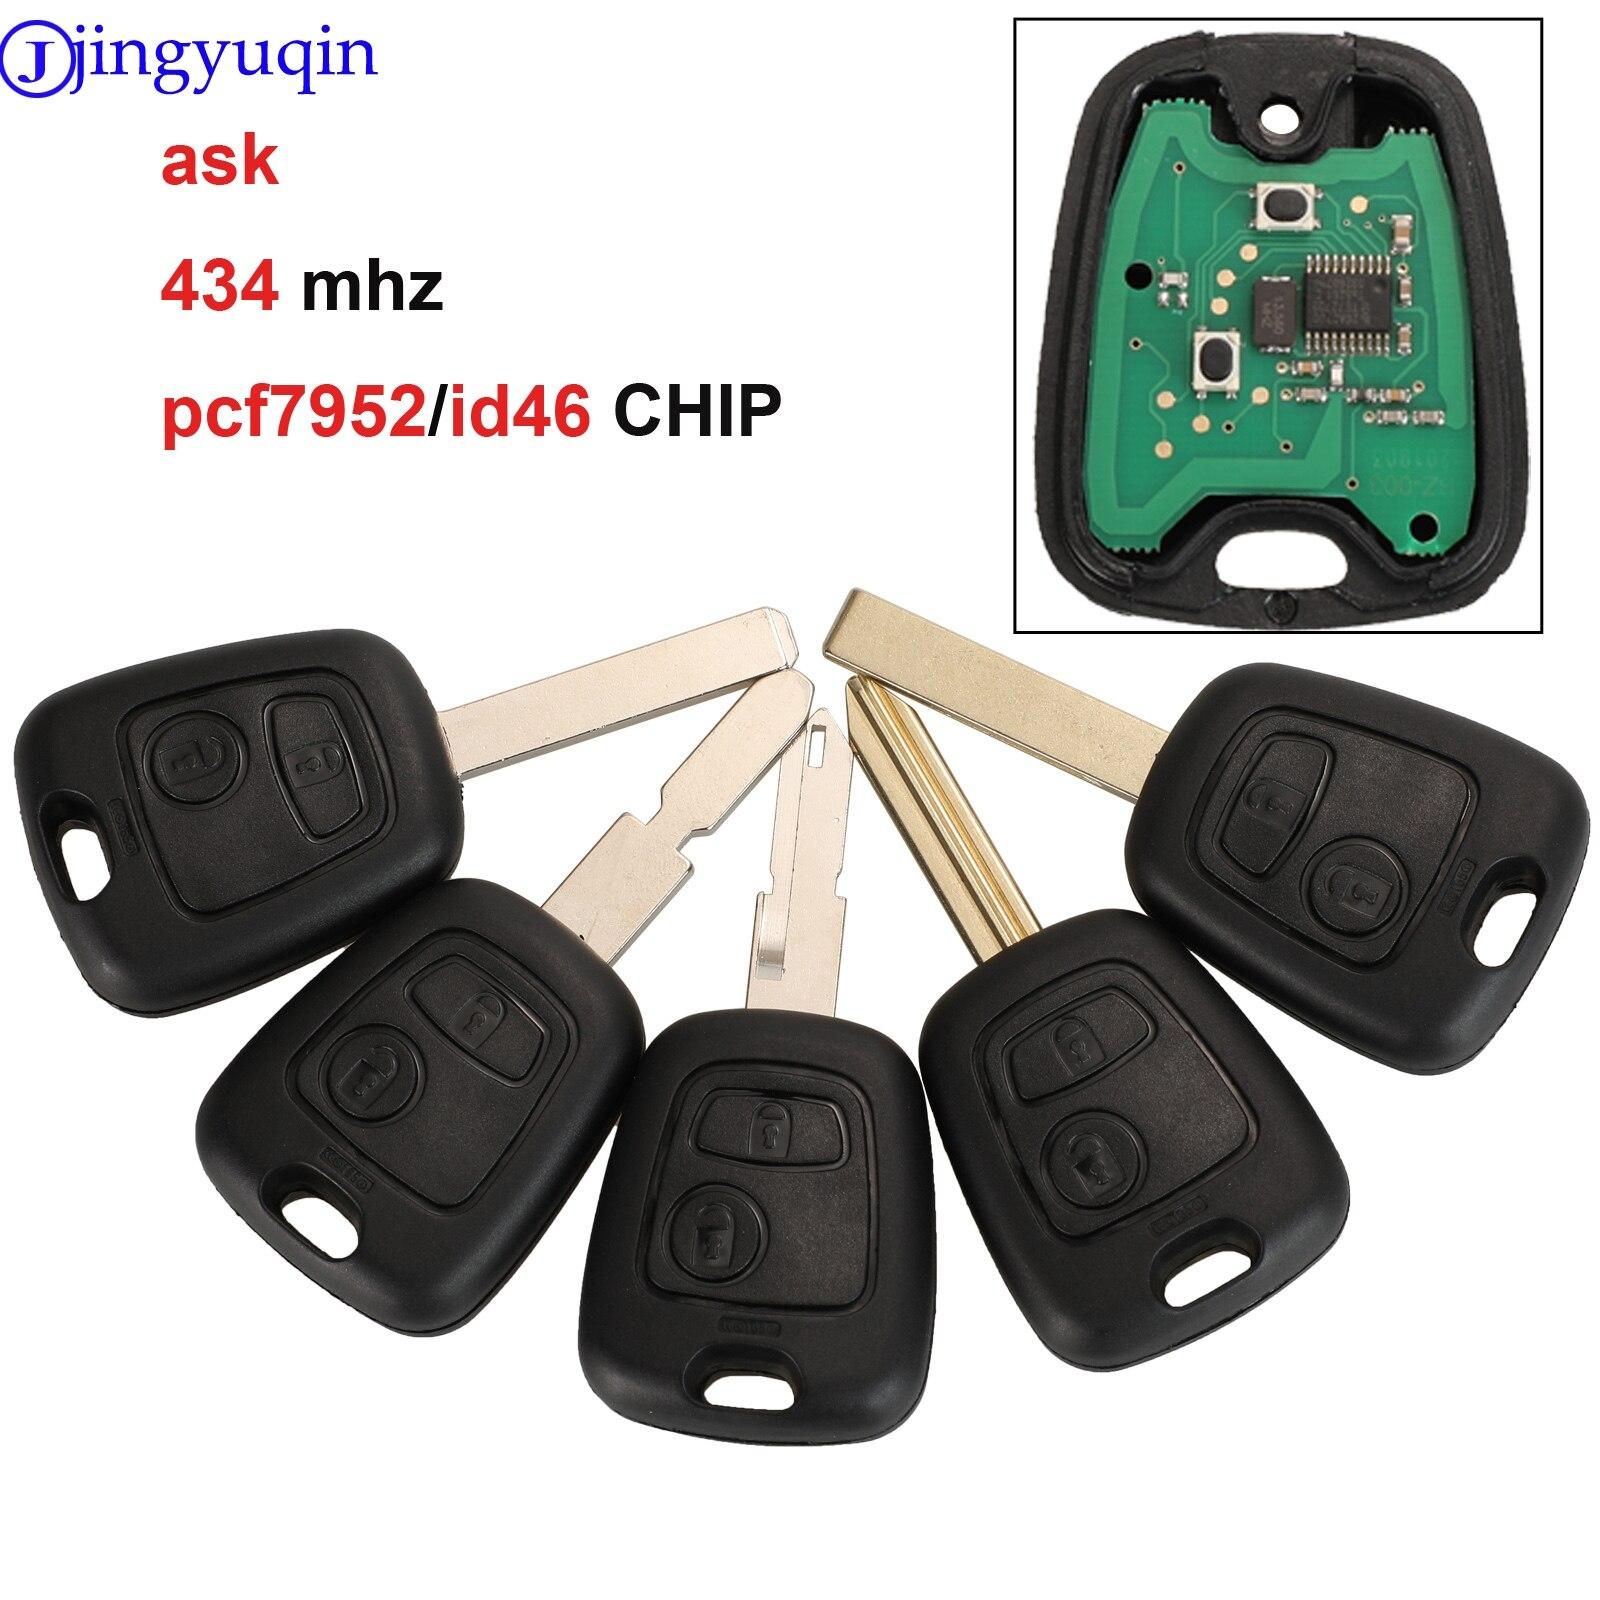 Jingyuqin 2 Tasten FRAGEN Remote Key Fob Controller Für PEUGEOT 206 433MHZ Mit PCF7961 Transponder Chip